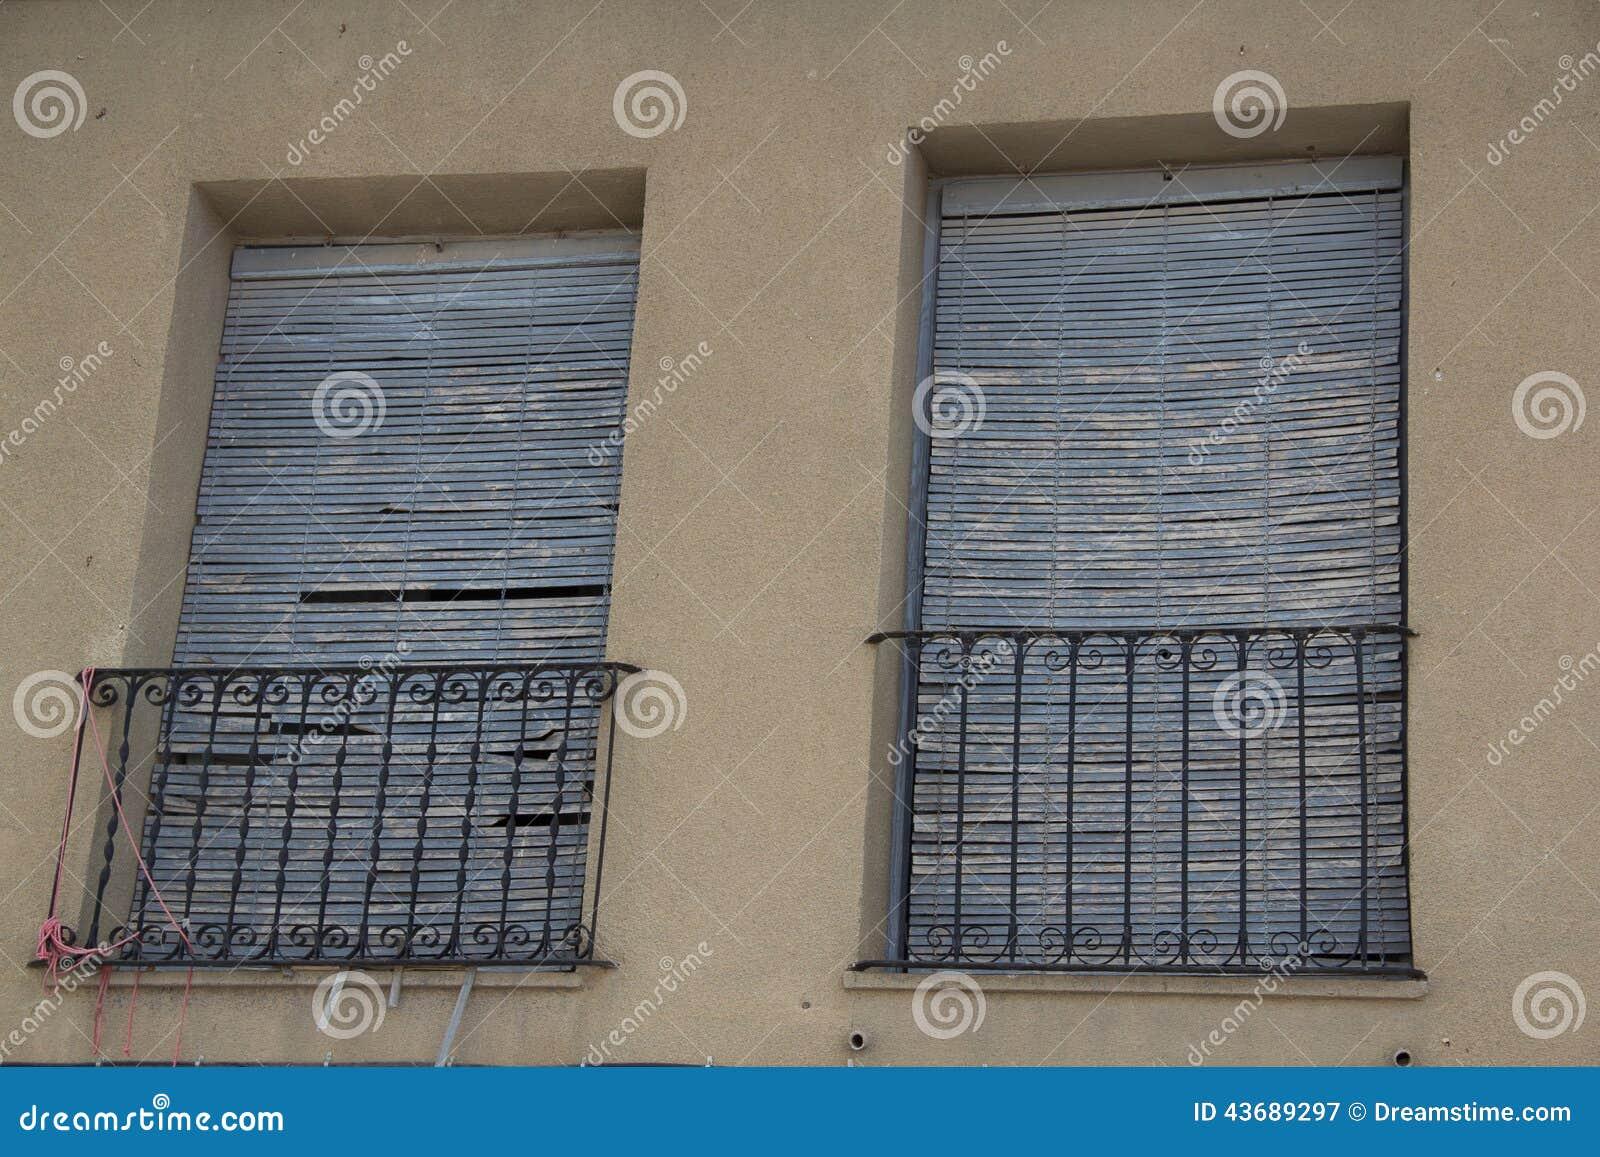 Puertas y ventanas viejas 22 stock photo image 43689297 for Puertas viejas